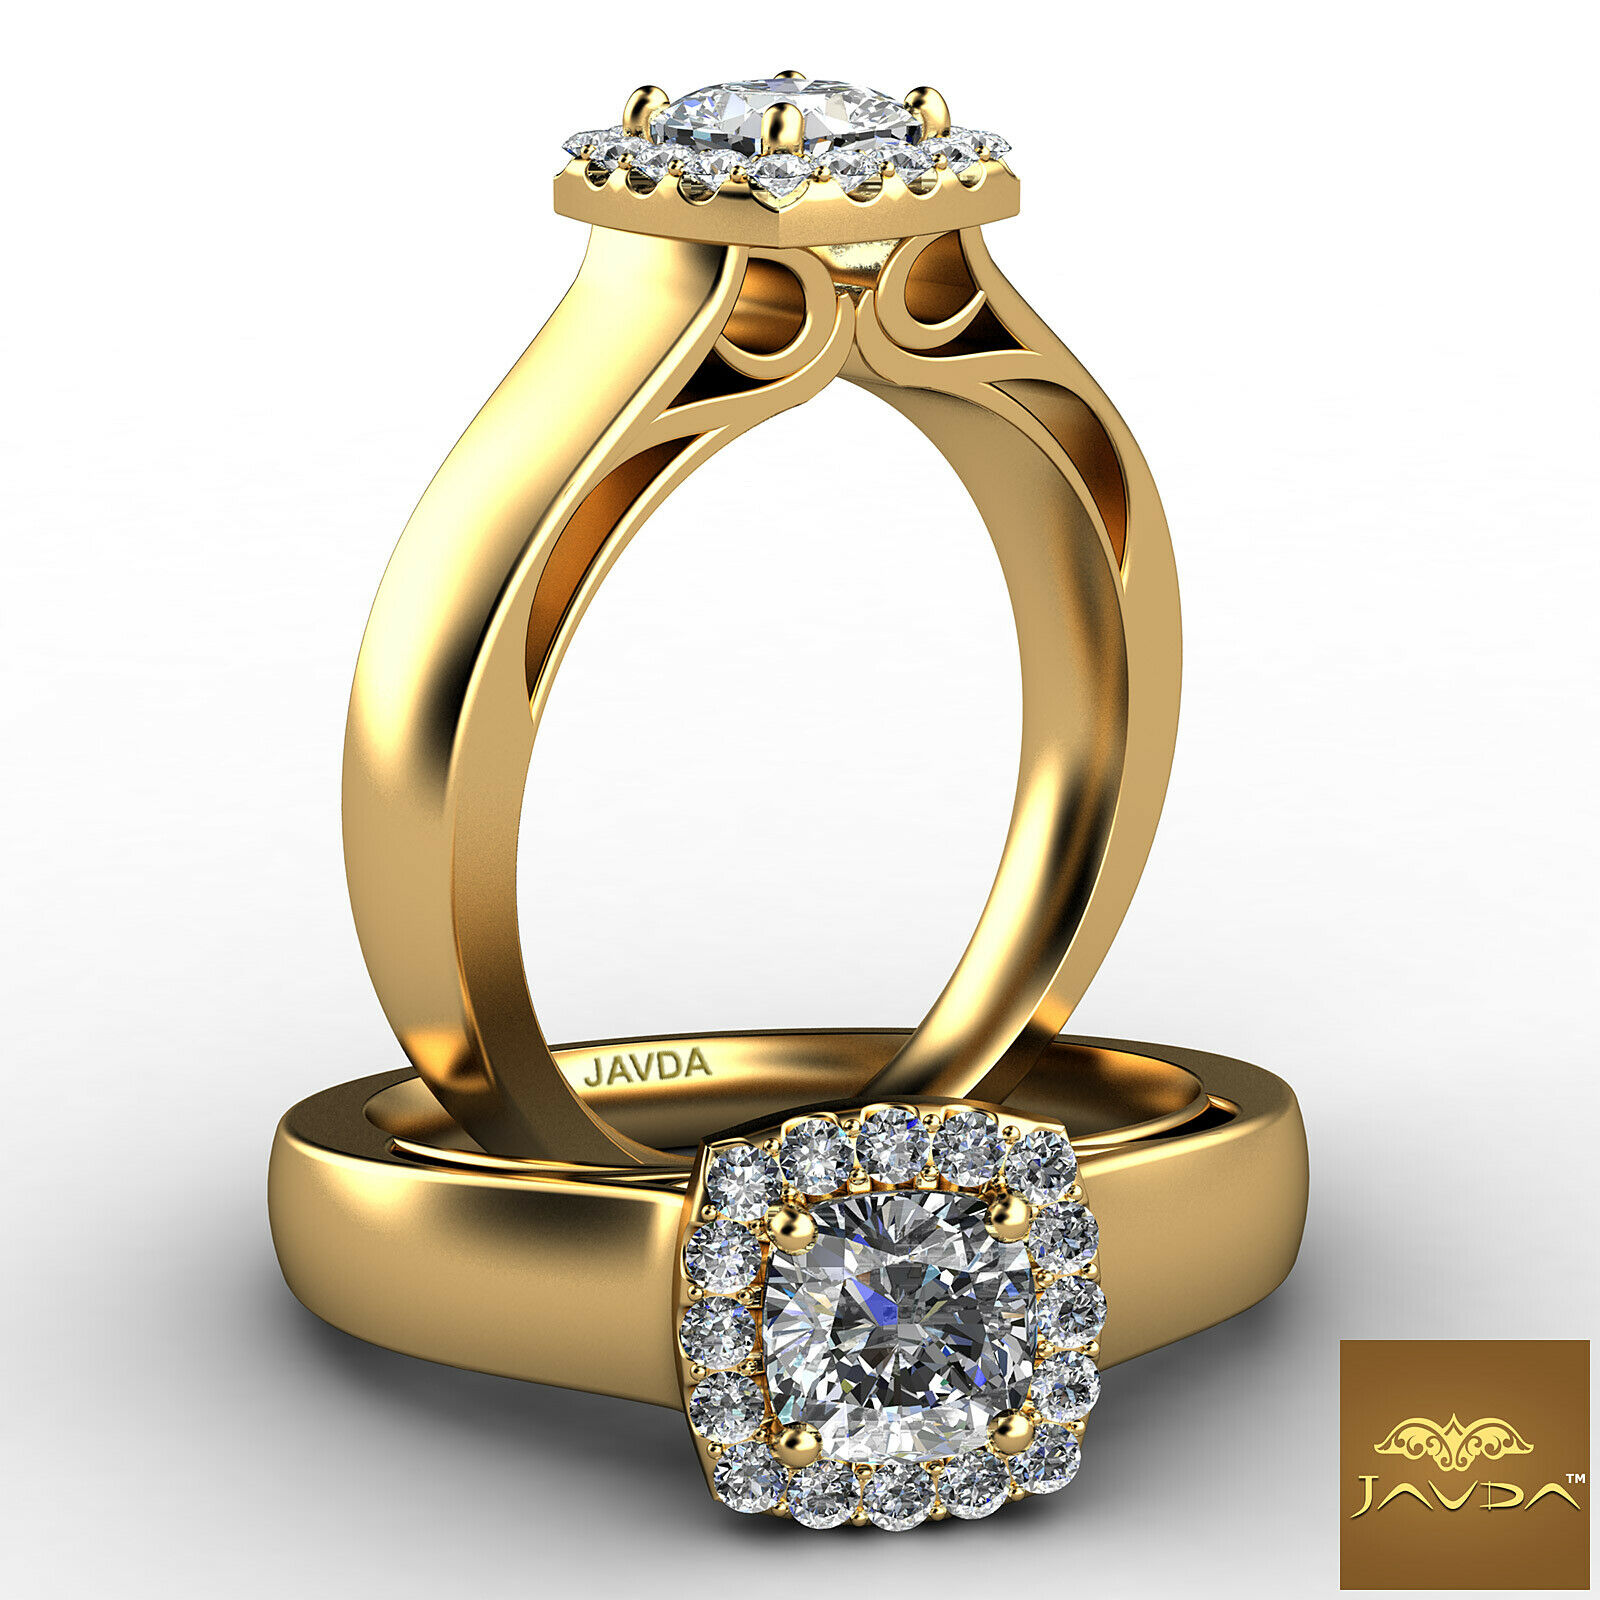 Halo Filigree Design Cushion Diamond Engagement French Pave Ring GIA G VS1 0.7Ct